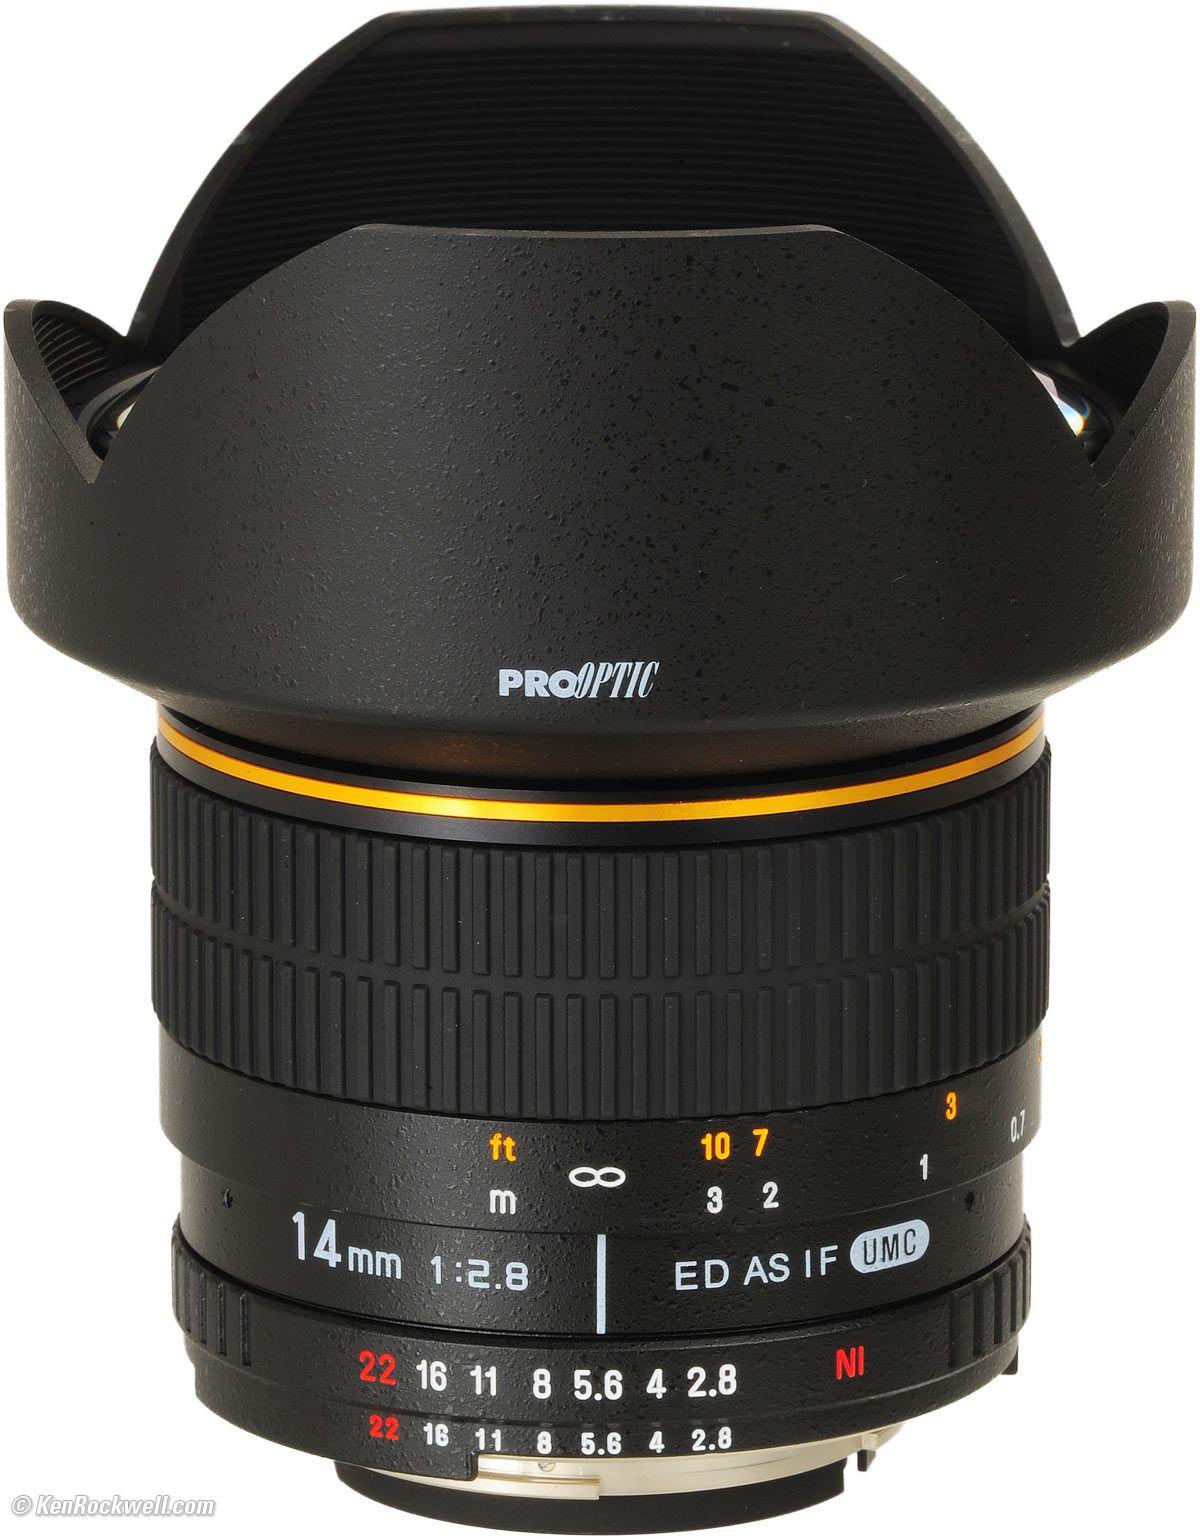 14mm F 2 8 Samyang Pro Optic Rokinon And Bower Lens 14mm Camera Lenses